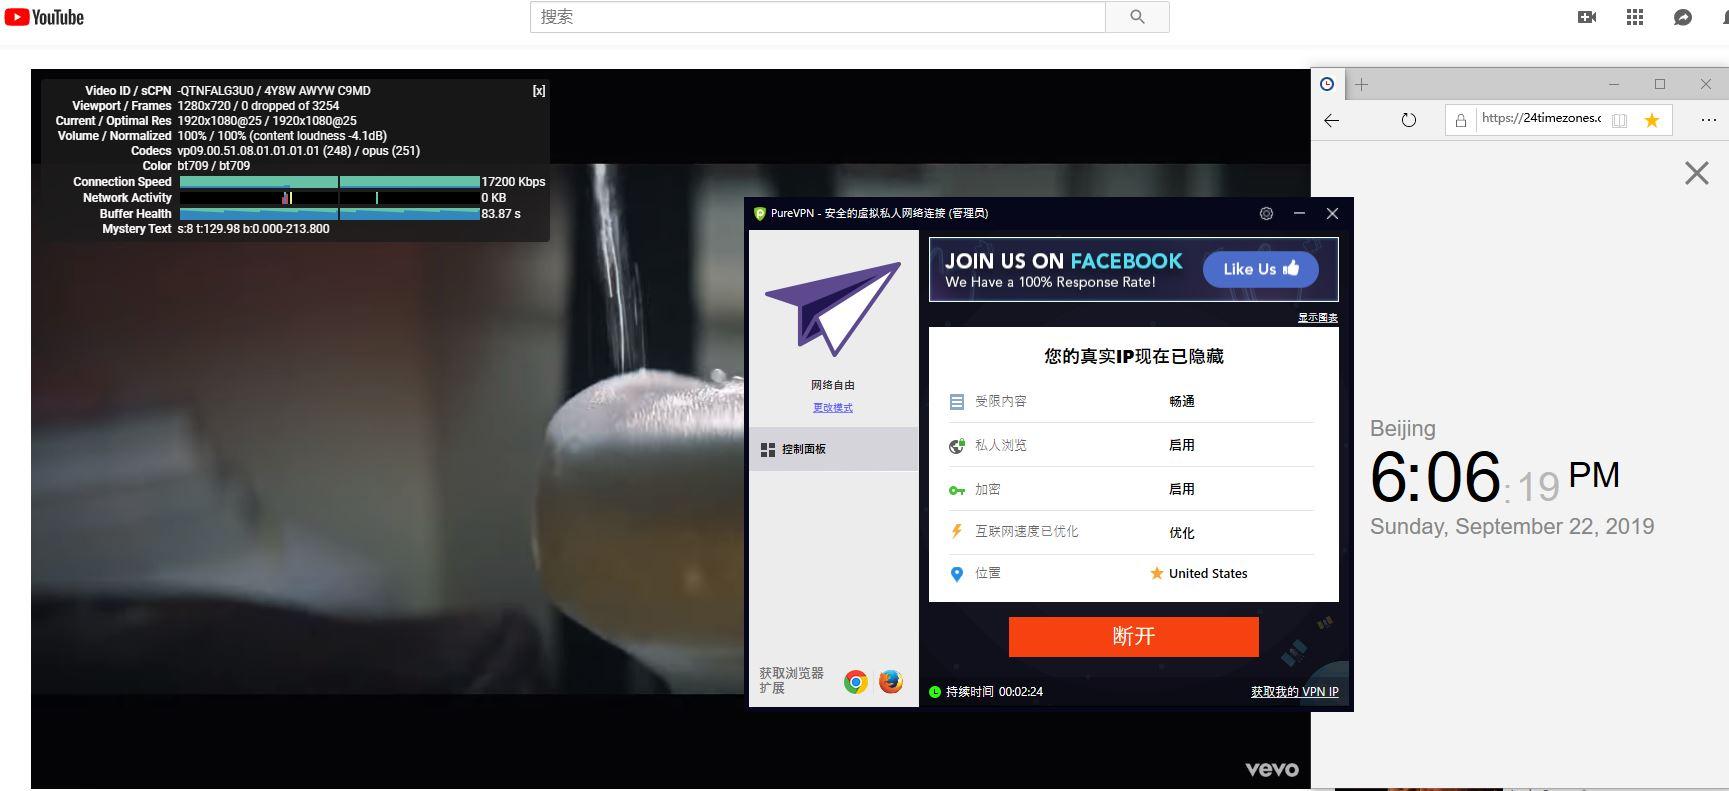 Windows PureVPN United States 服务器 中国VPN翻墙 科学上网 YouTube测速-20190922